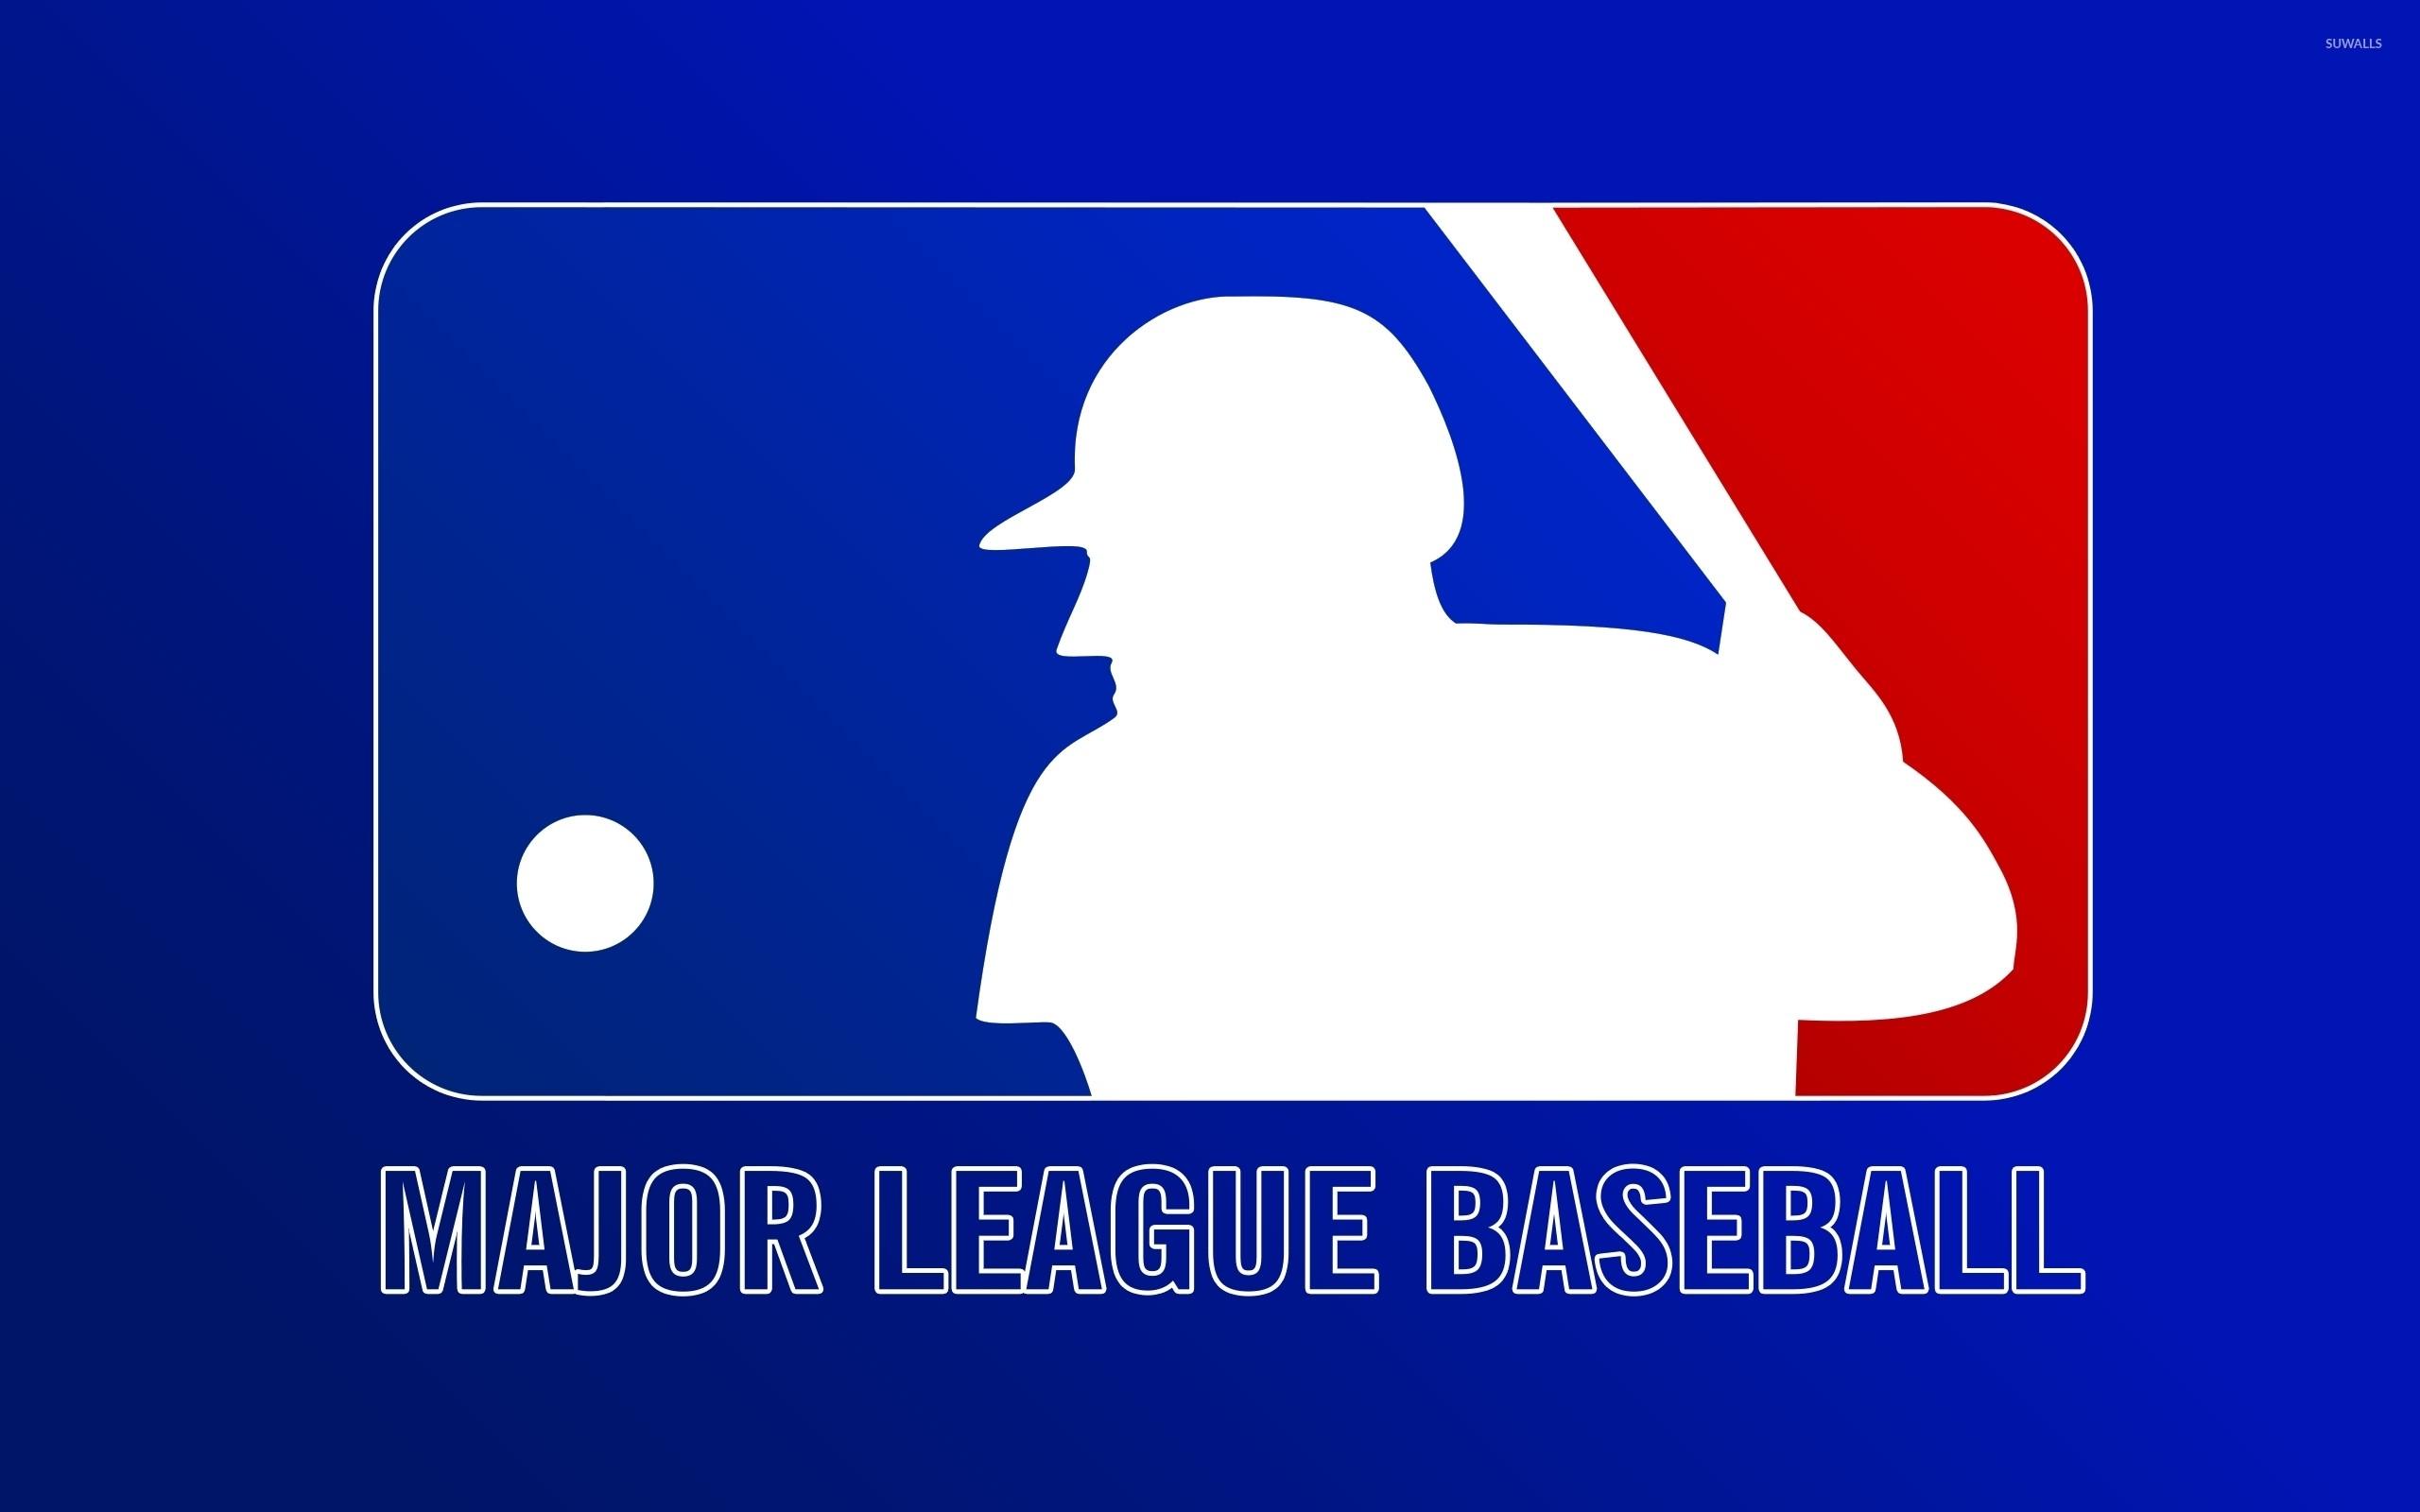 Major League Baseball wallpaper jpg